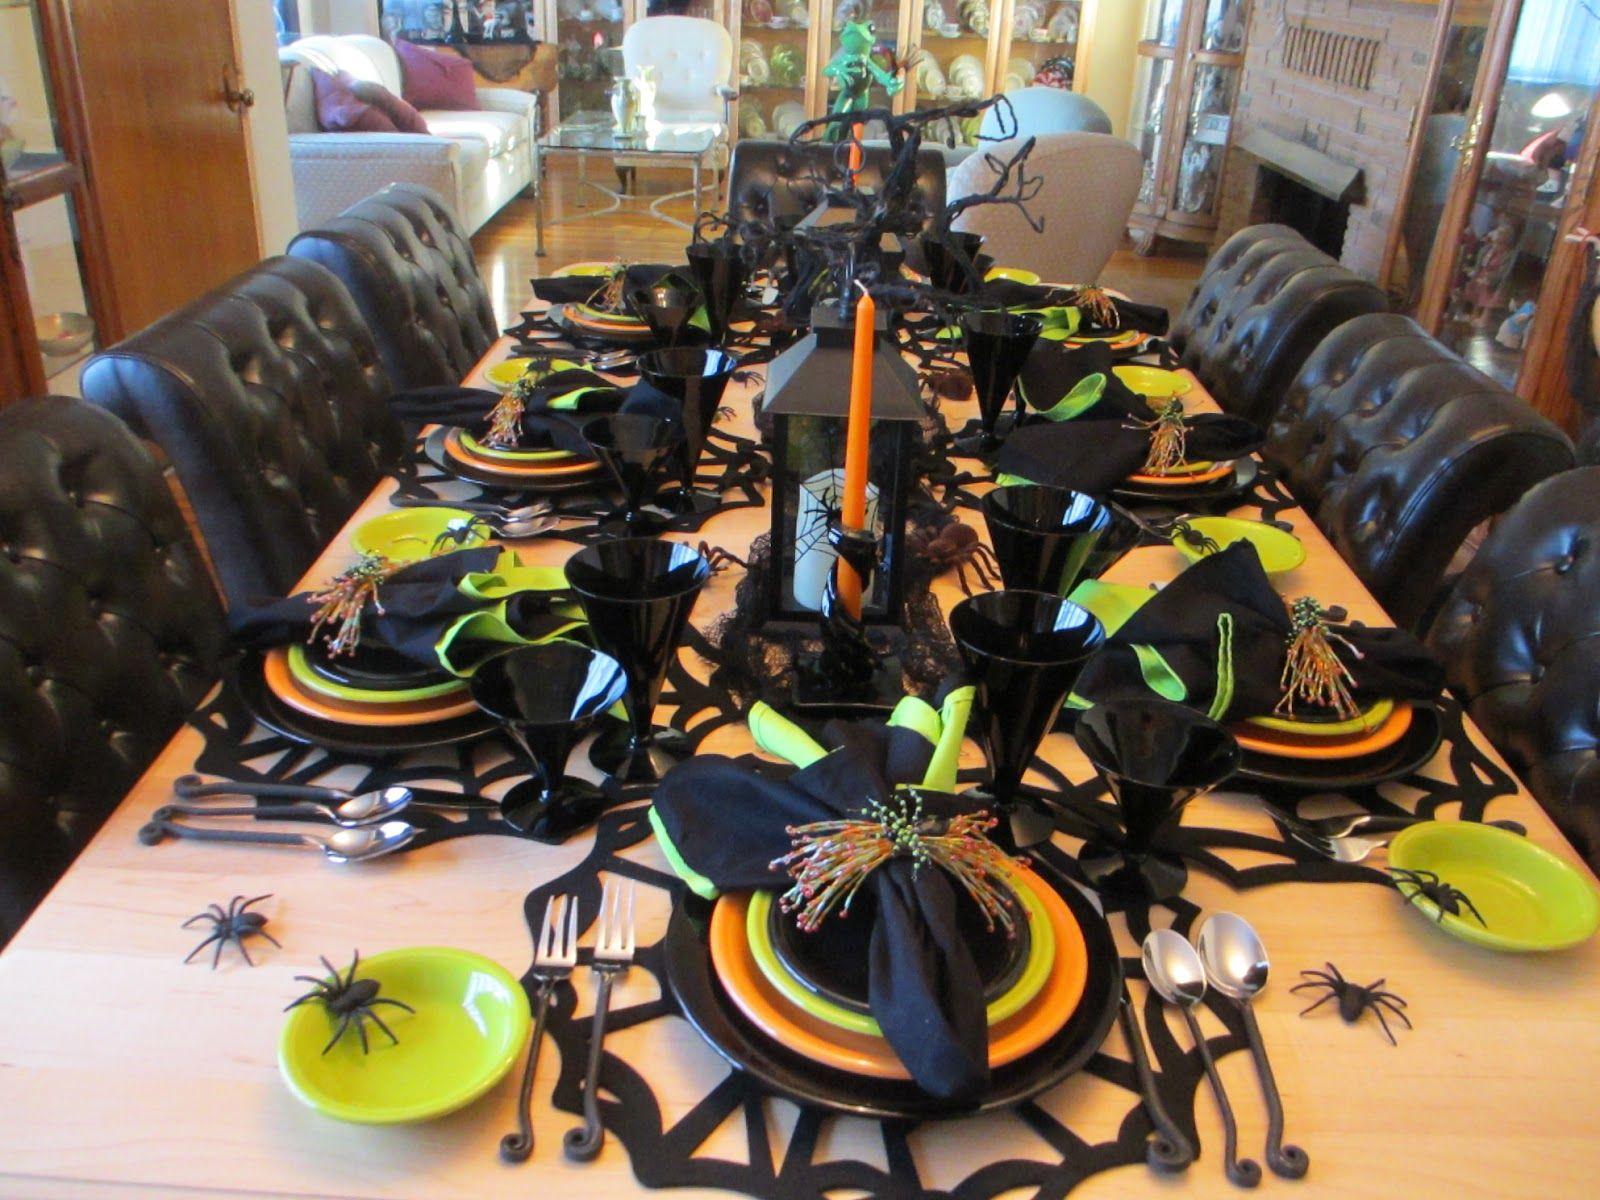 Fiestaware Halloween Table Setting Idea